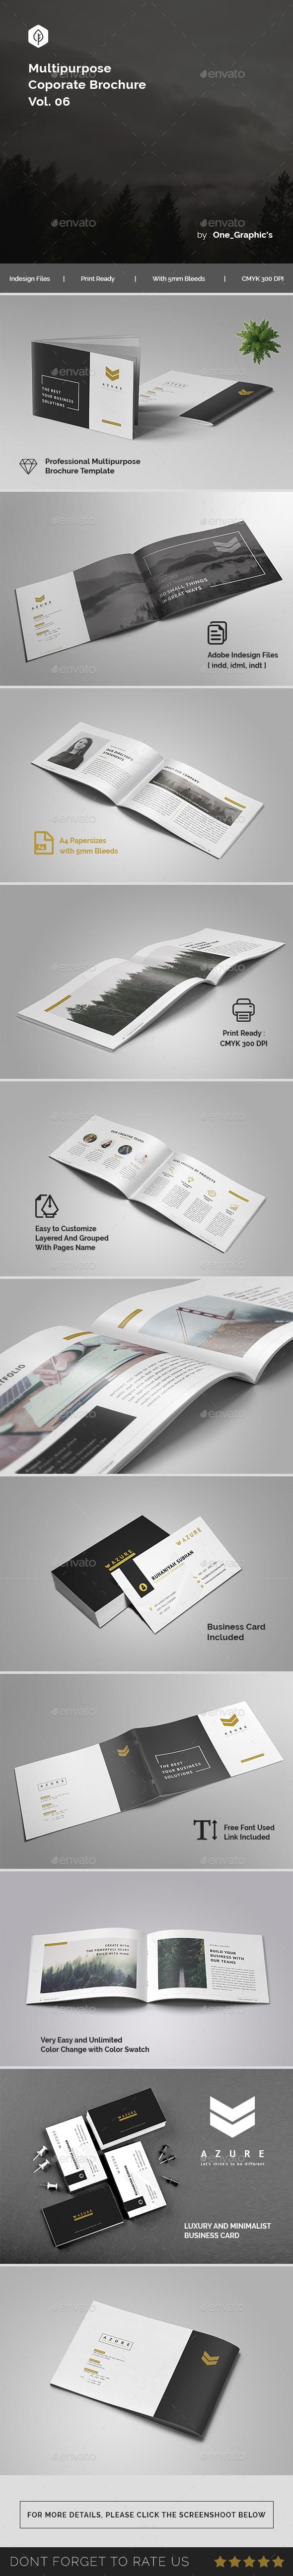 Multipurpose Corporate Brochure Template Vol. 06 - Print Templates